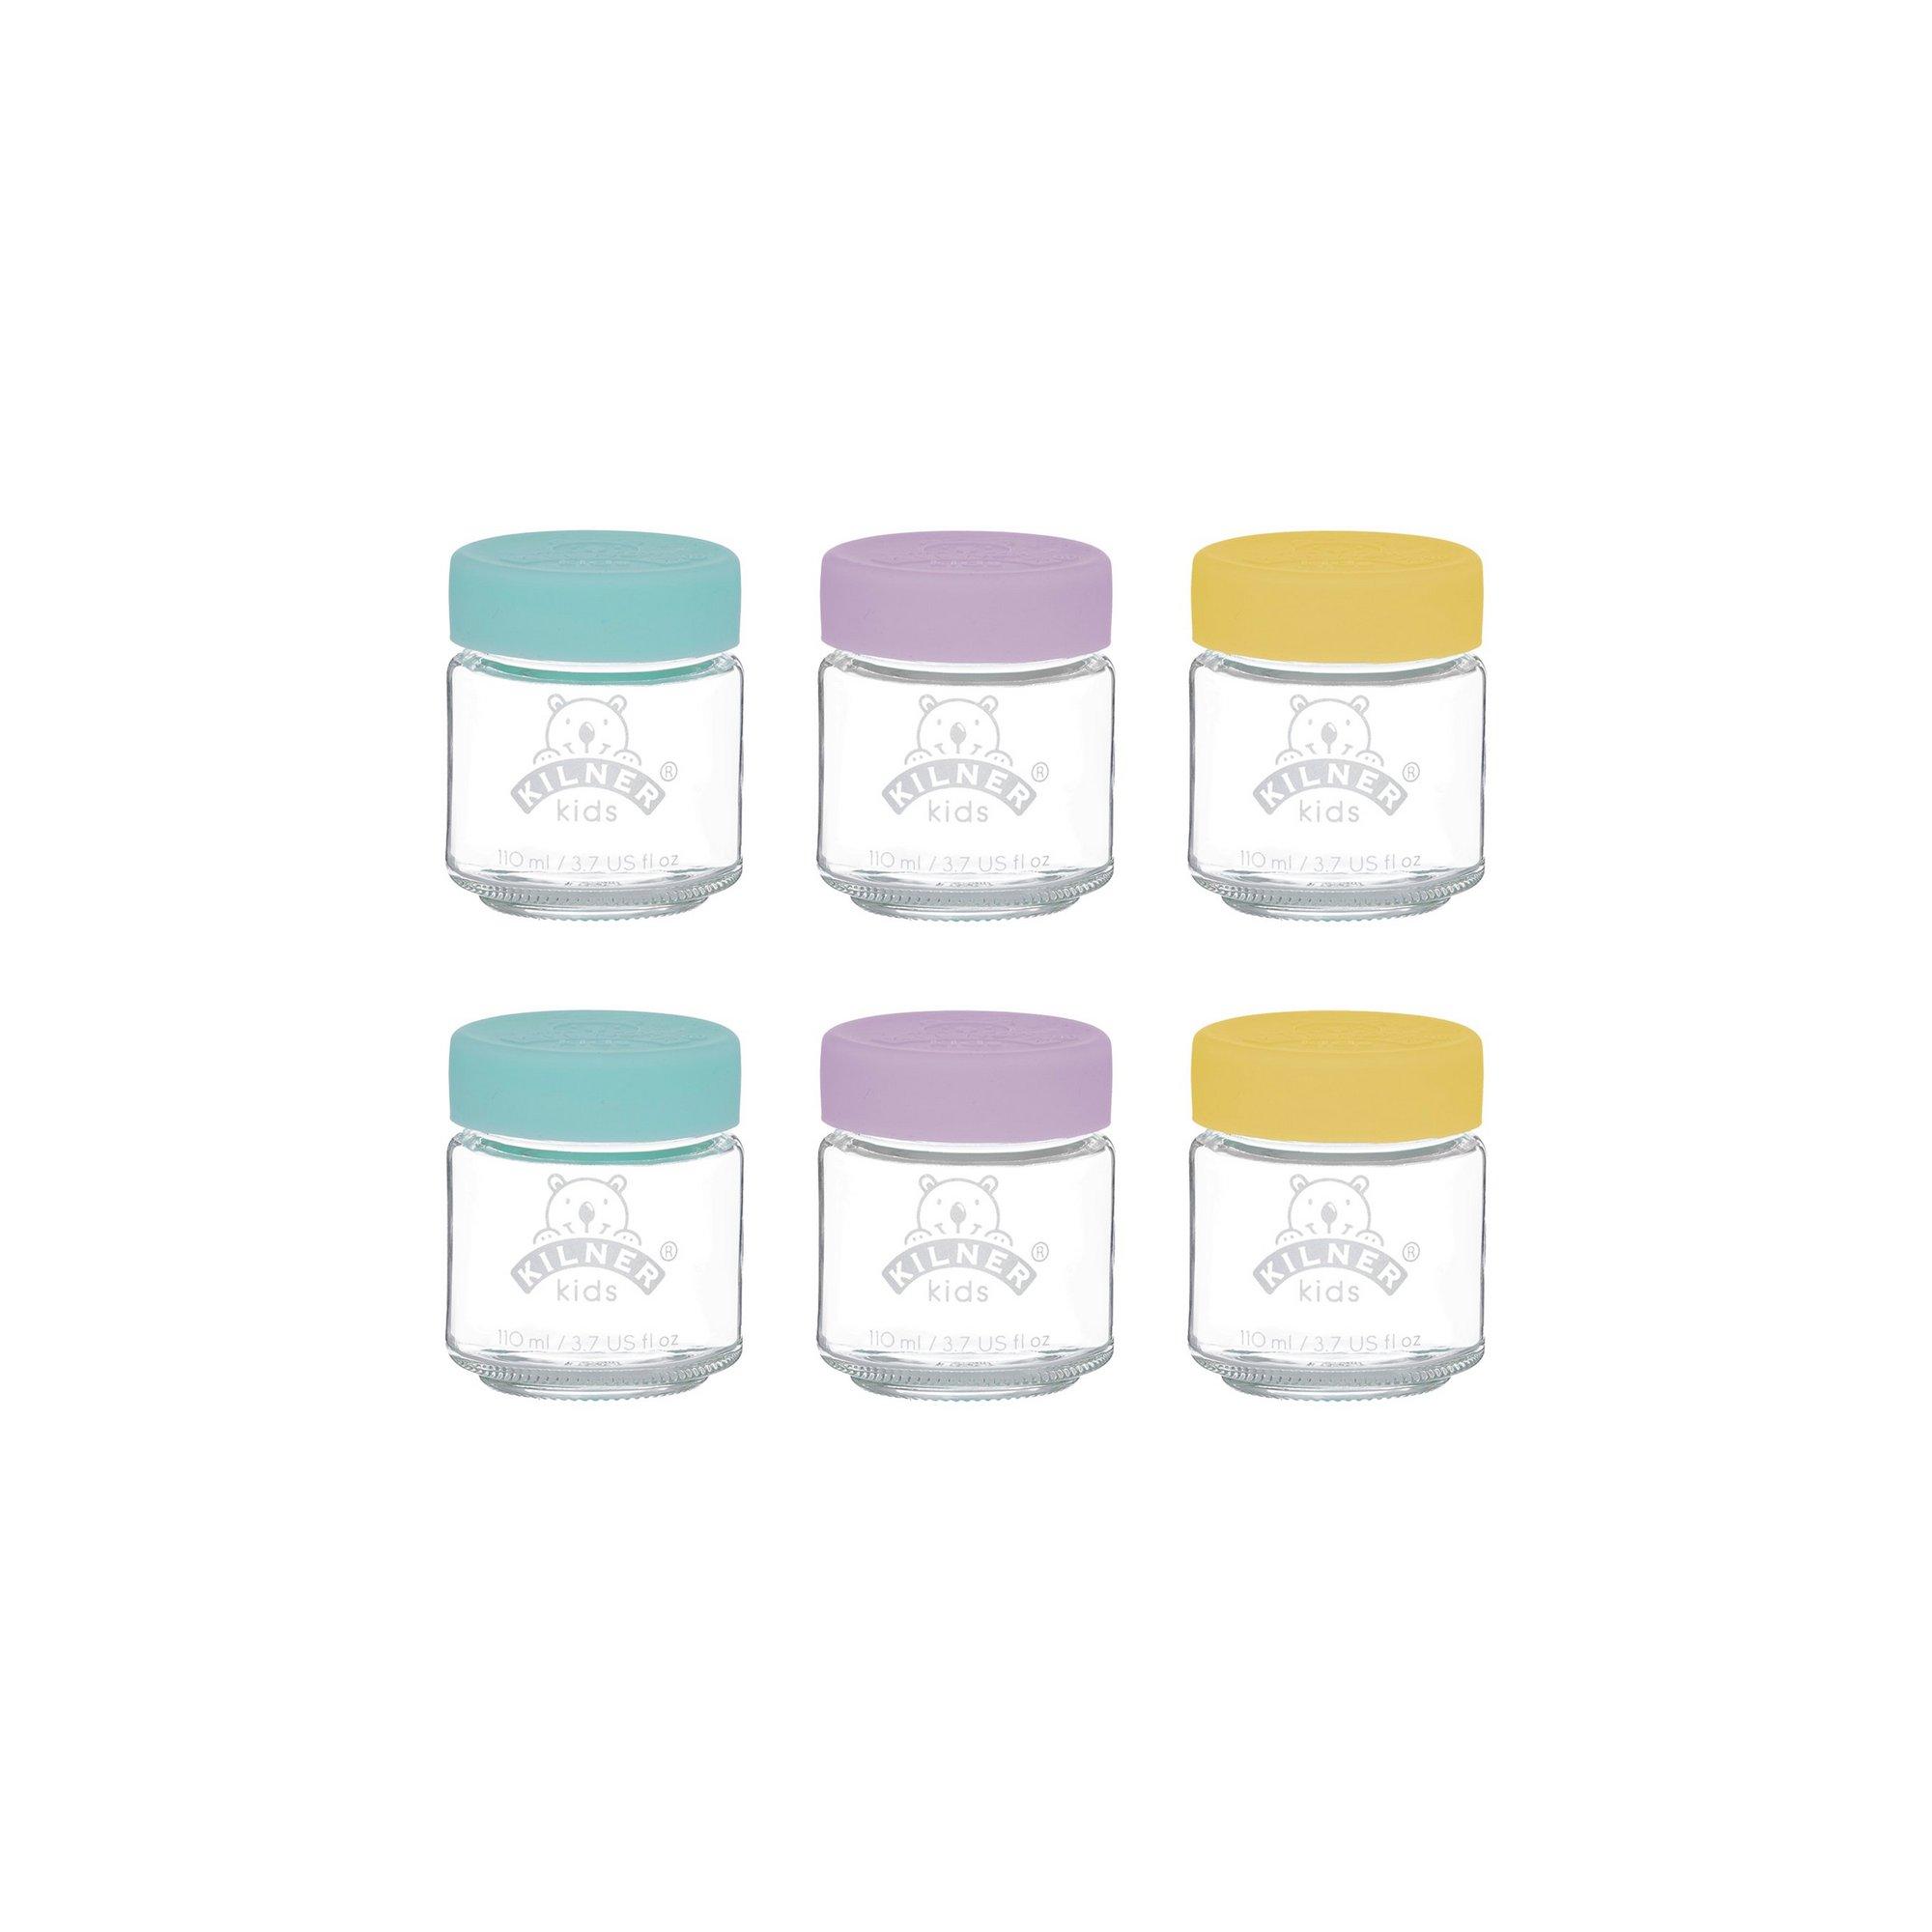 Image of Kilner Set of 6 110ml Kids Jars